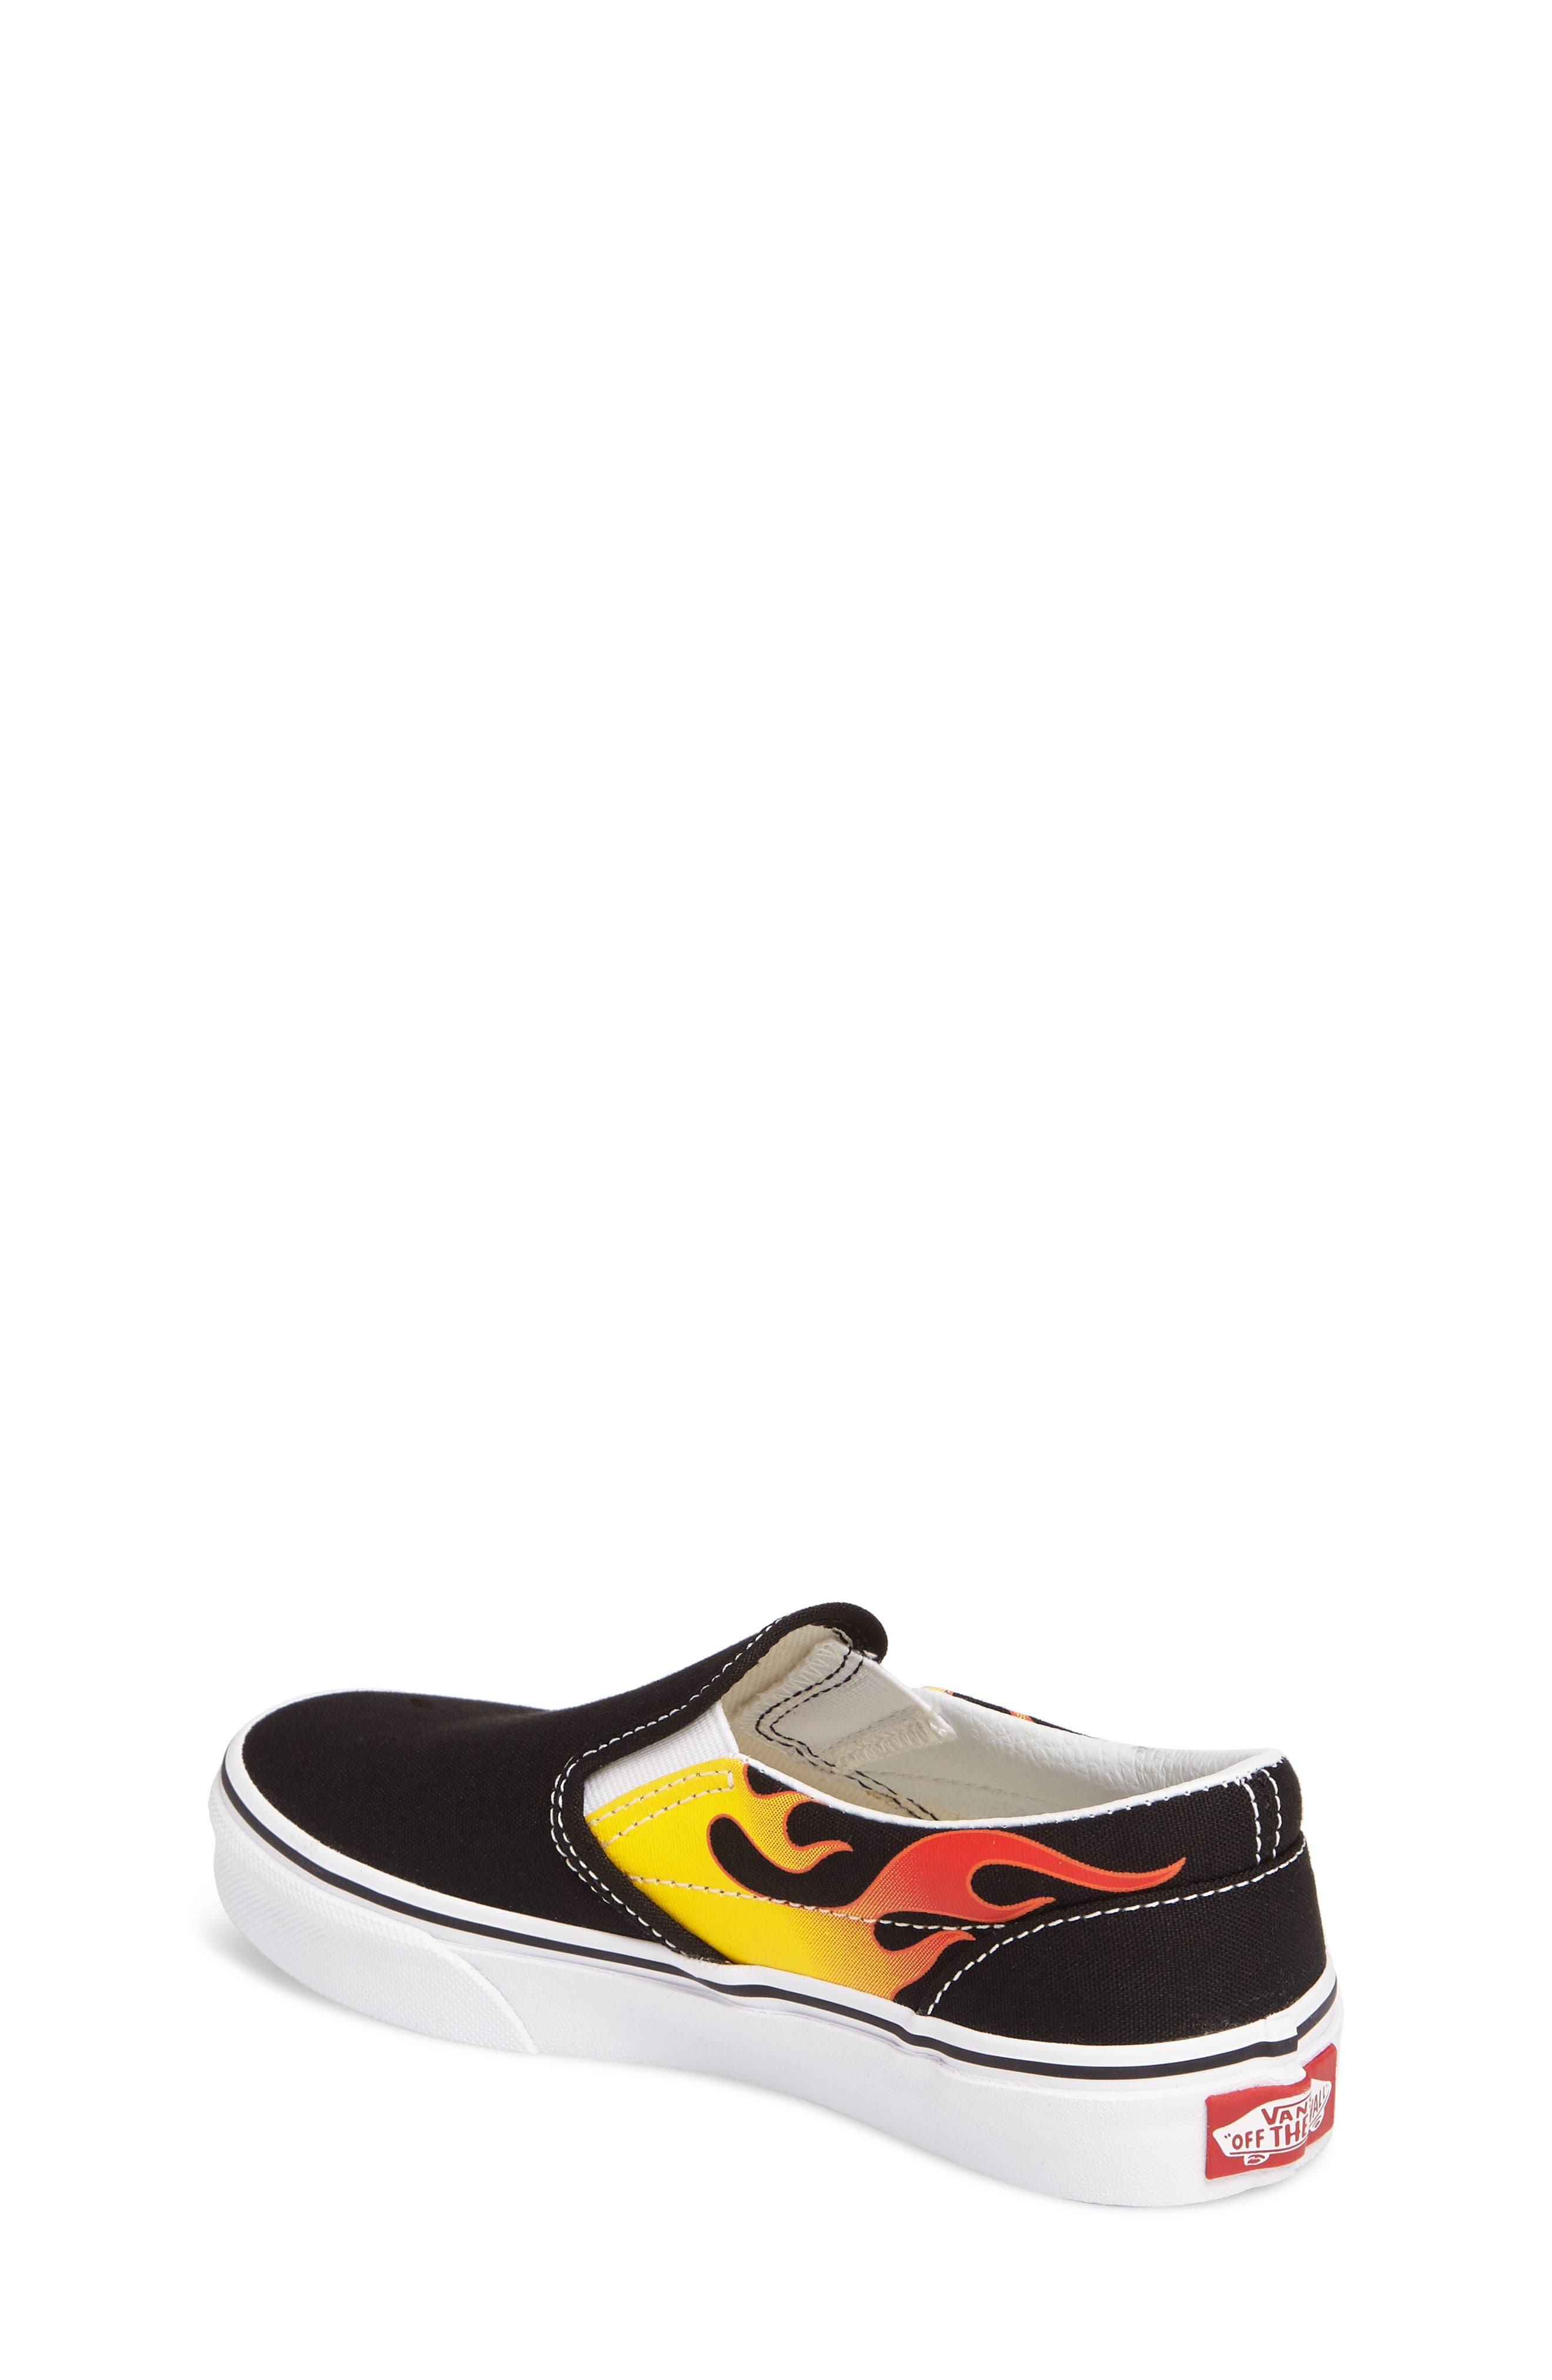 Flame Classic Slip-On Sneaker,                             Alternate thumbnail 2, color,                             002